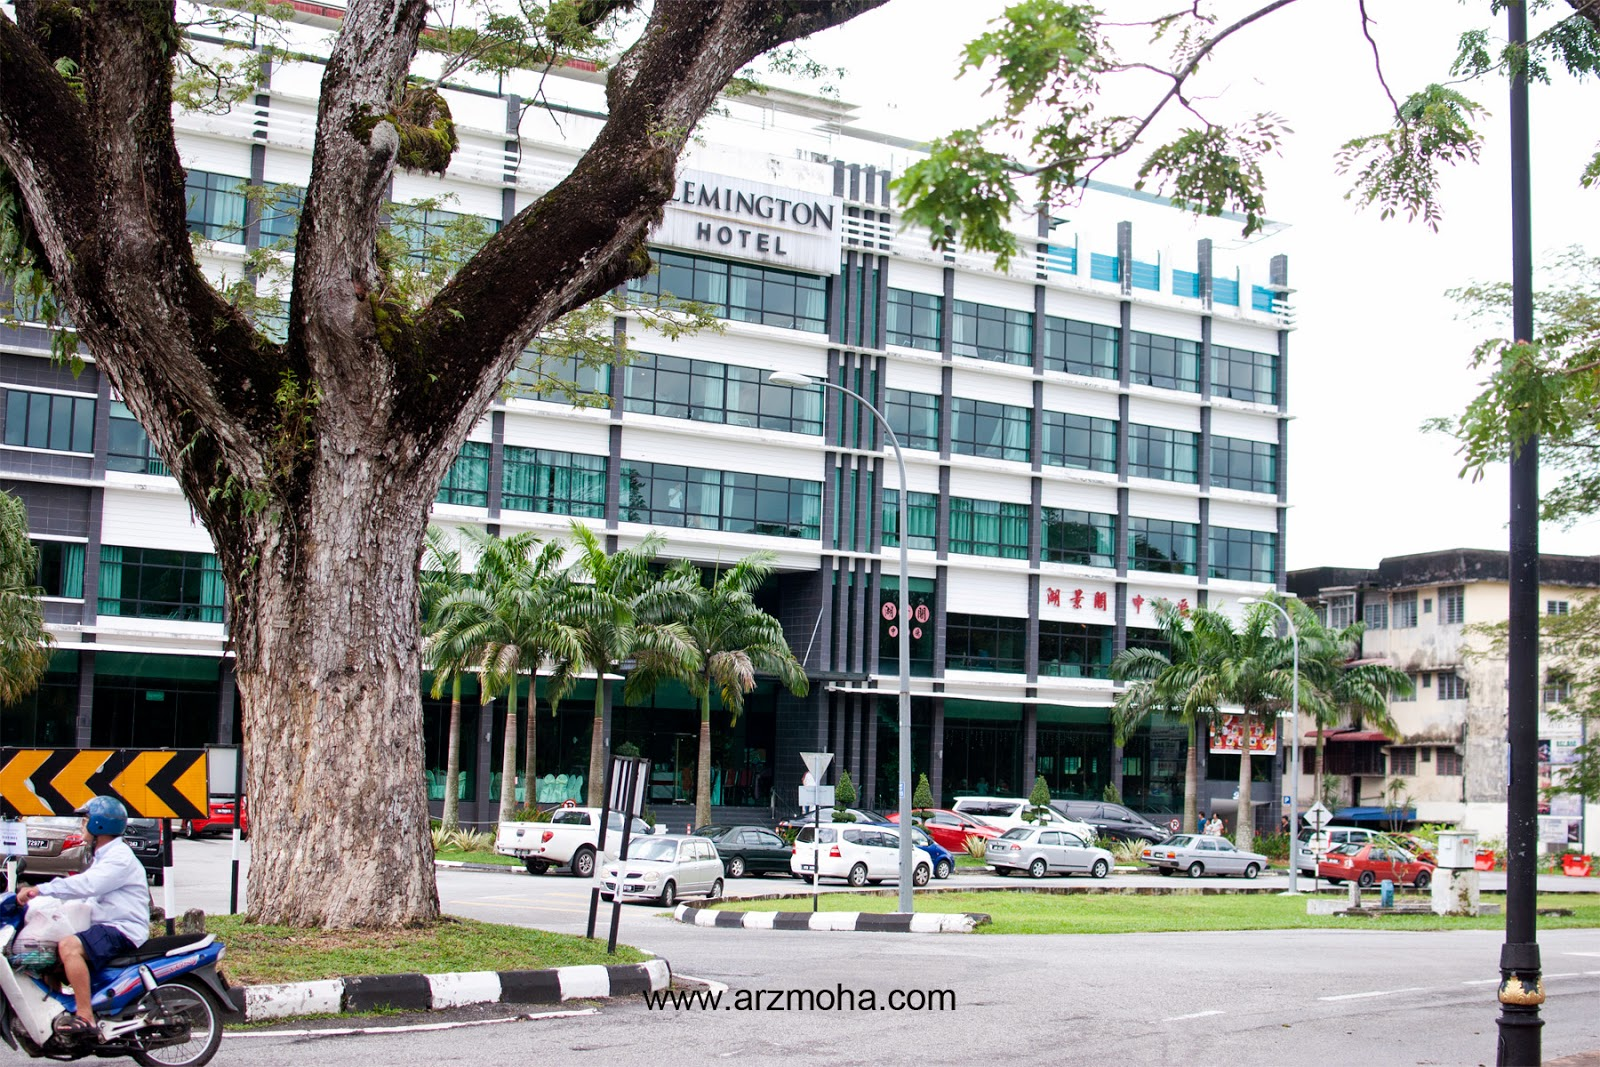 Visit perak, Visit Malaysia, Flemington, Hotel, Taman Tasik Taiping, Taiping, holiday, gambar cantik, arzmohdhaniffa, photography, arzmoha, nice place